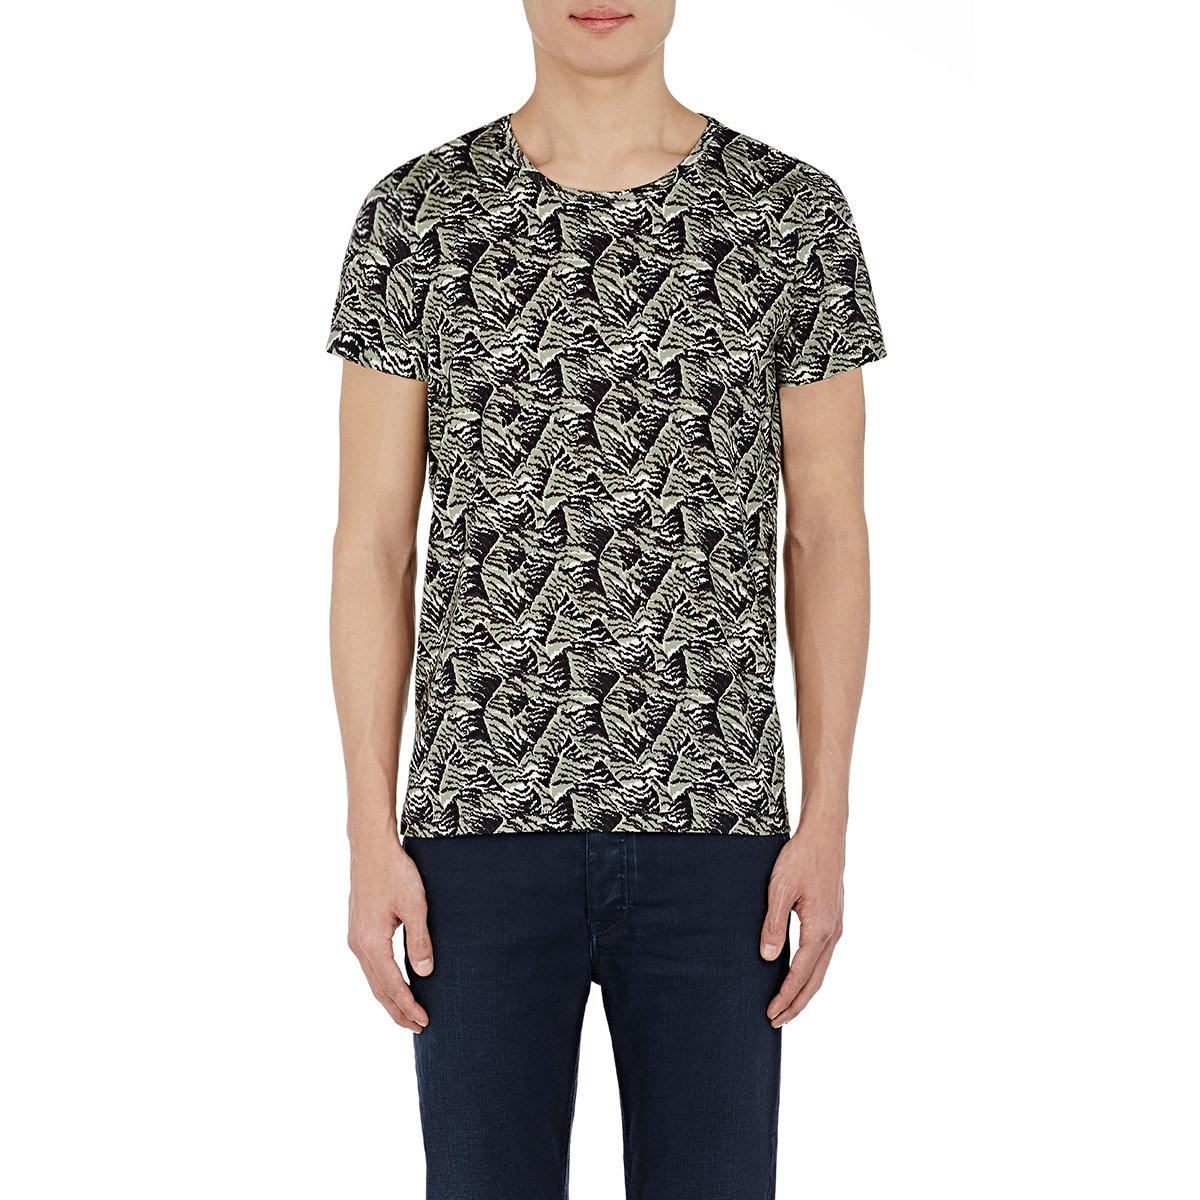 Acne Studios Standard Wild T Shirt In Black For Men Lyst